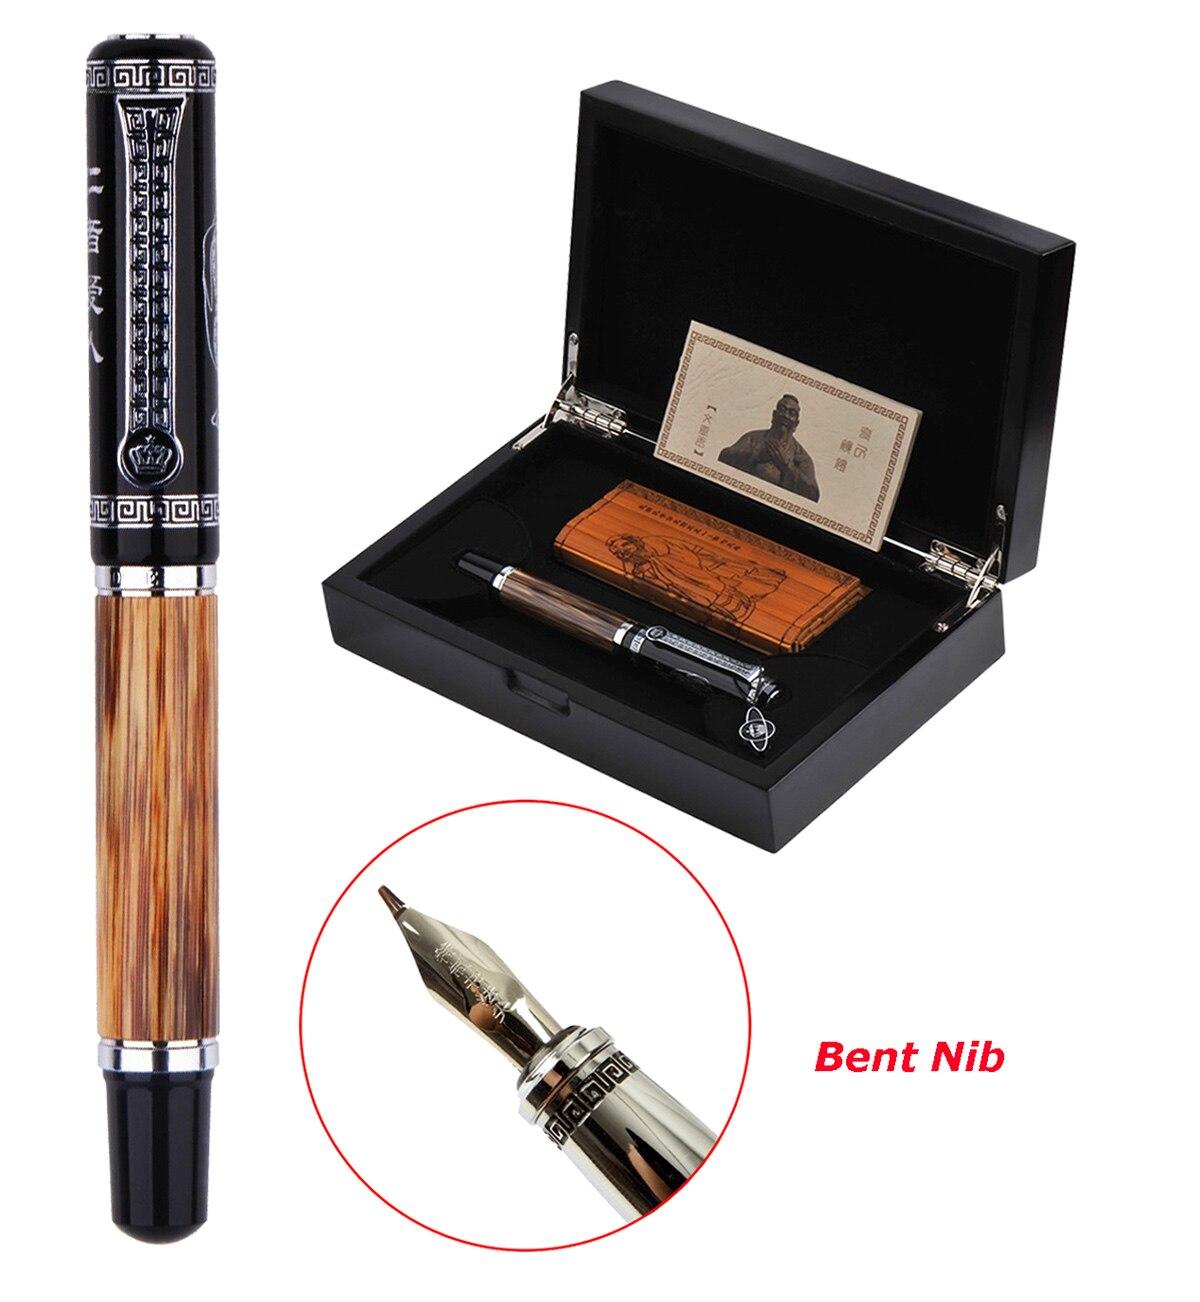 Duke Classic Confucius Natural Bamboo Metal Embossed Pattern Bent Nib Calligraphy Fountain Pen Iridium 1.2mm for Office / Gift